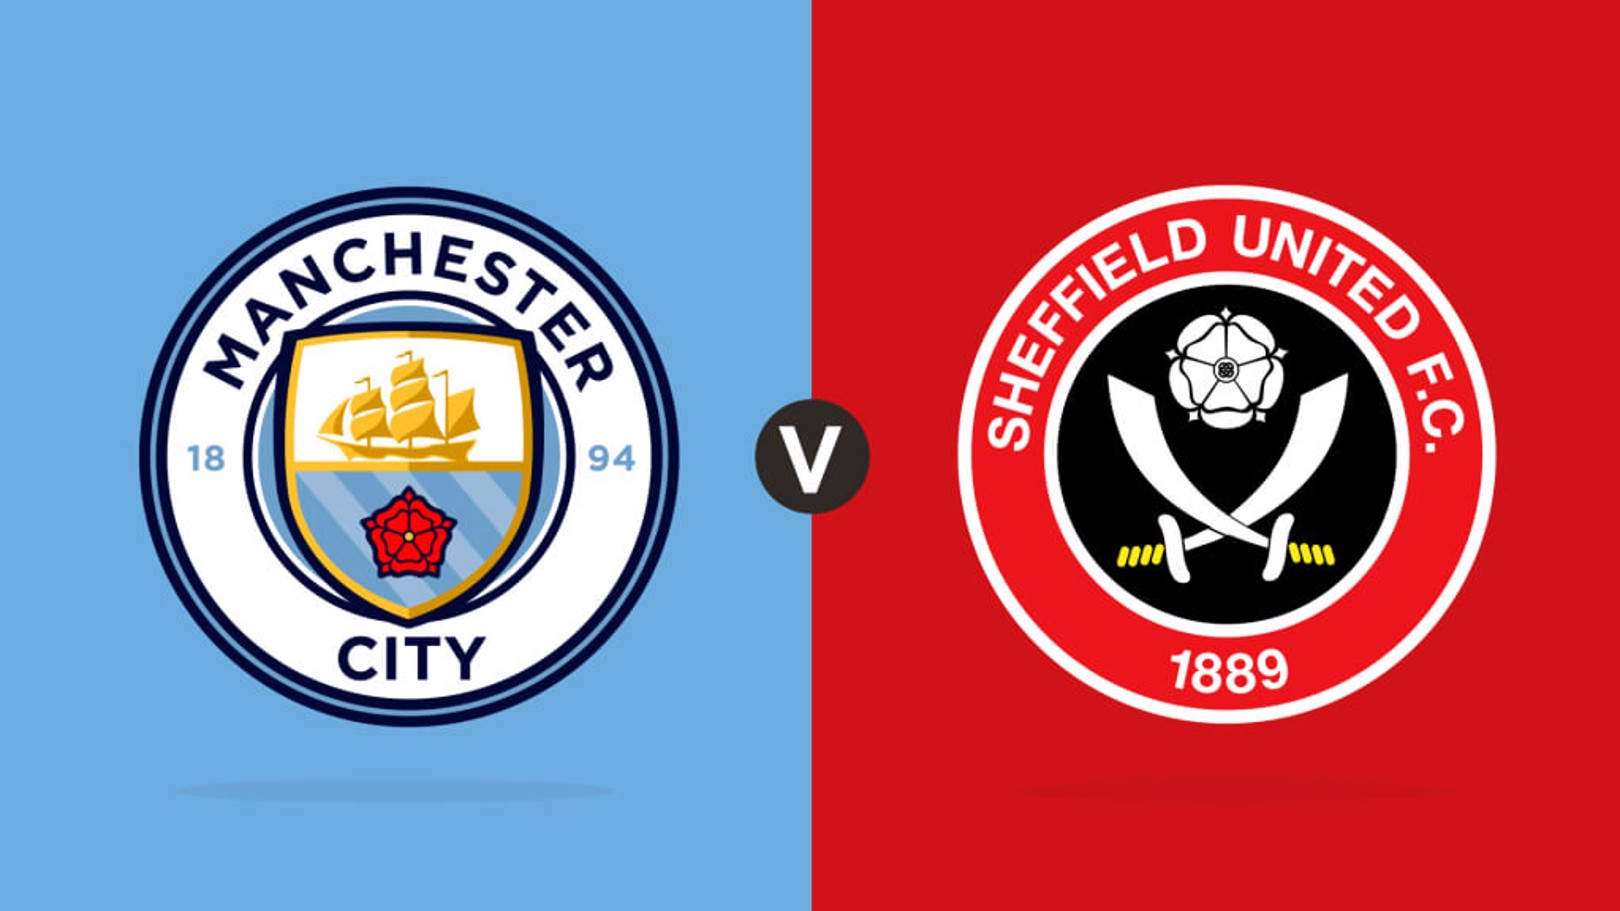 City v Sheffield Utd MATCH DAY LIVE